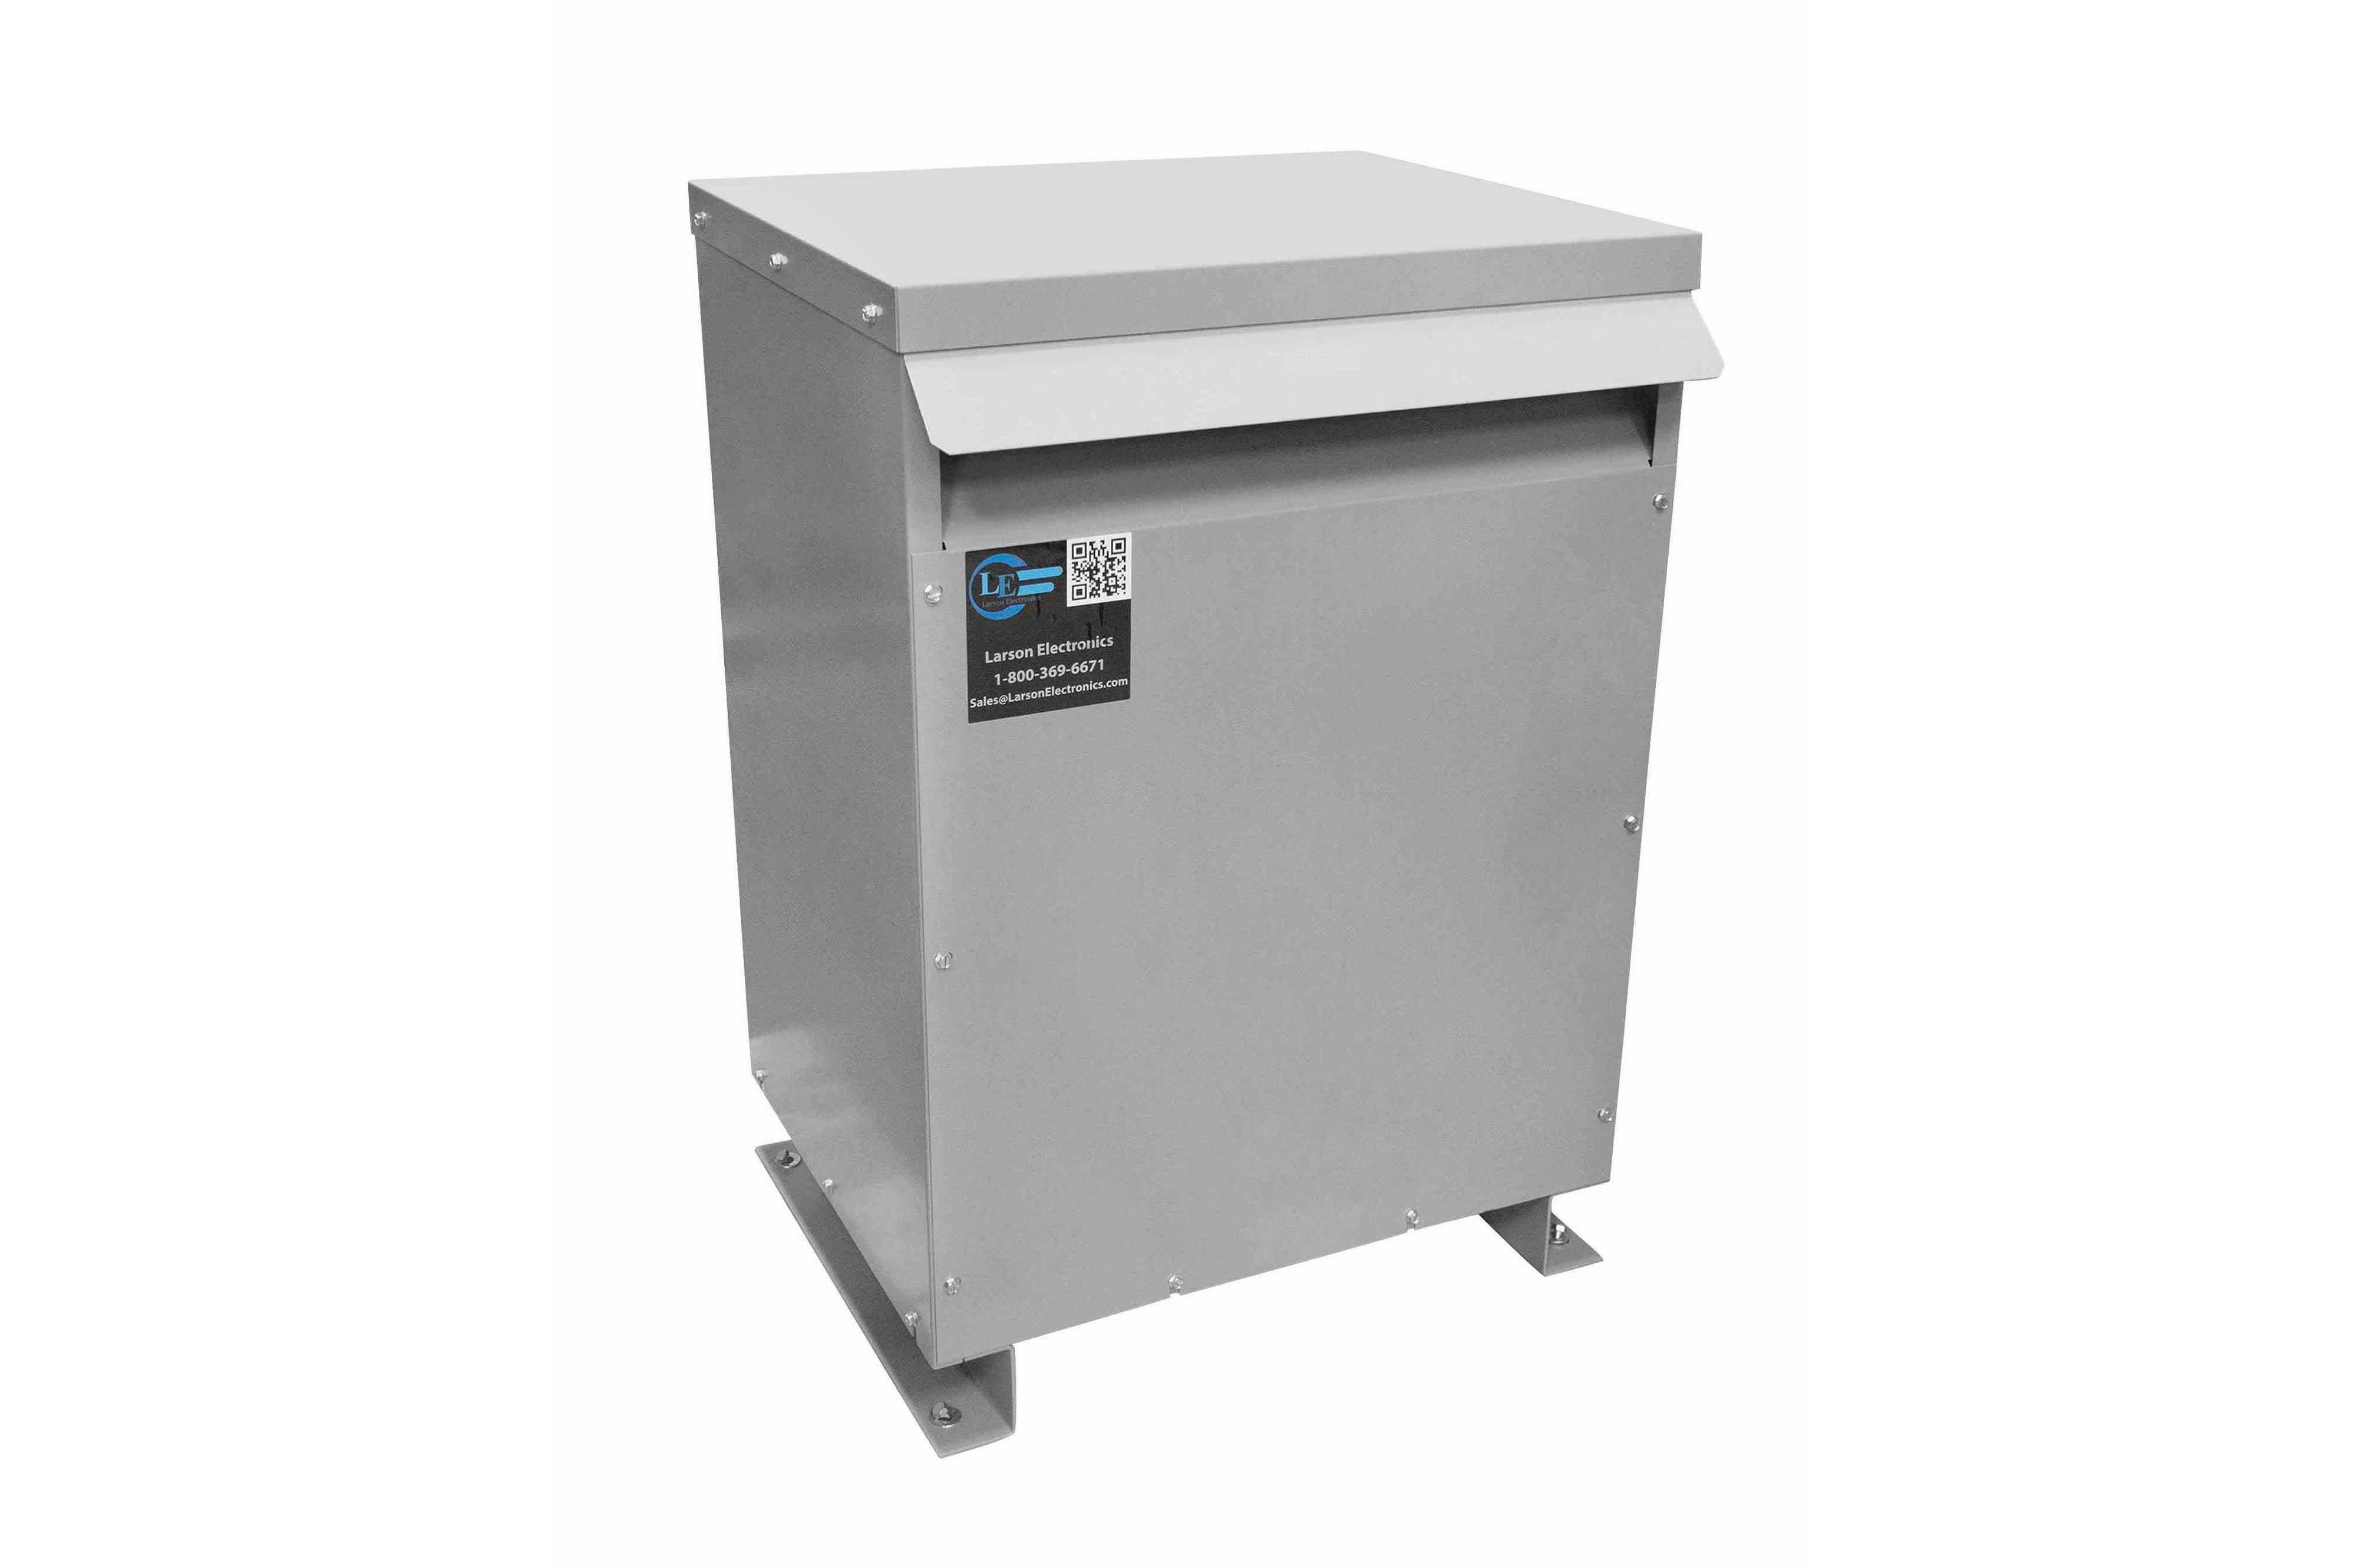 36 kVA 3PH Isolation Transformer, 208V Wye Primary, 600V Delta Secondary, N3R, Ventilated, 60 Hz